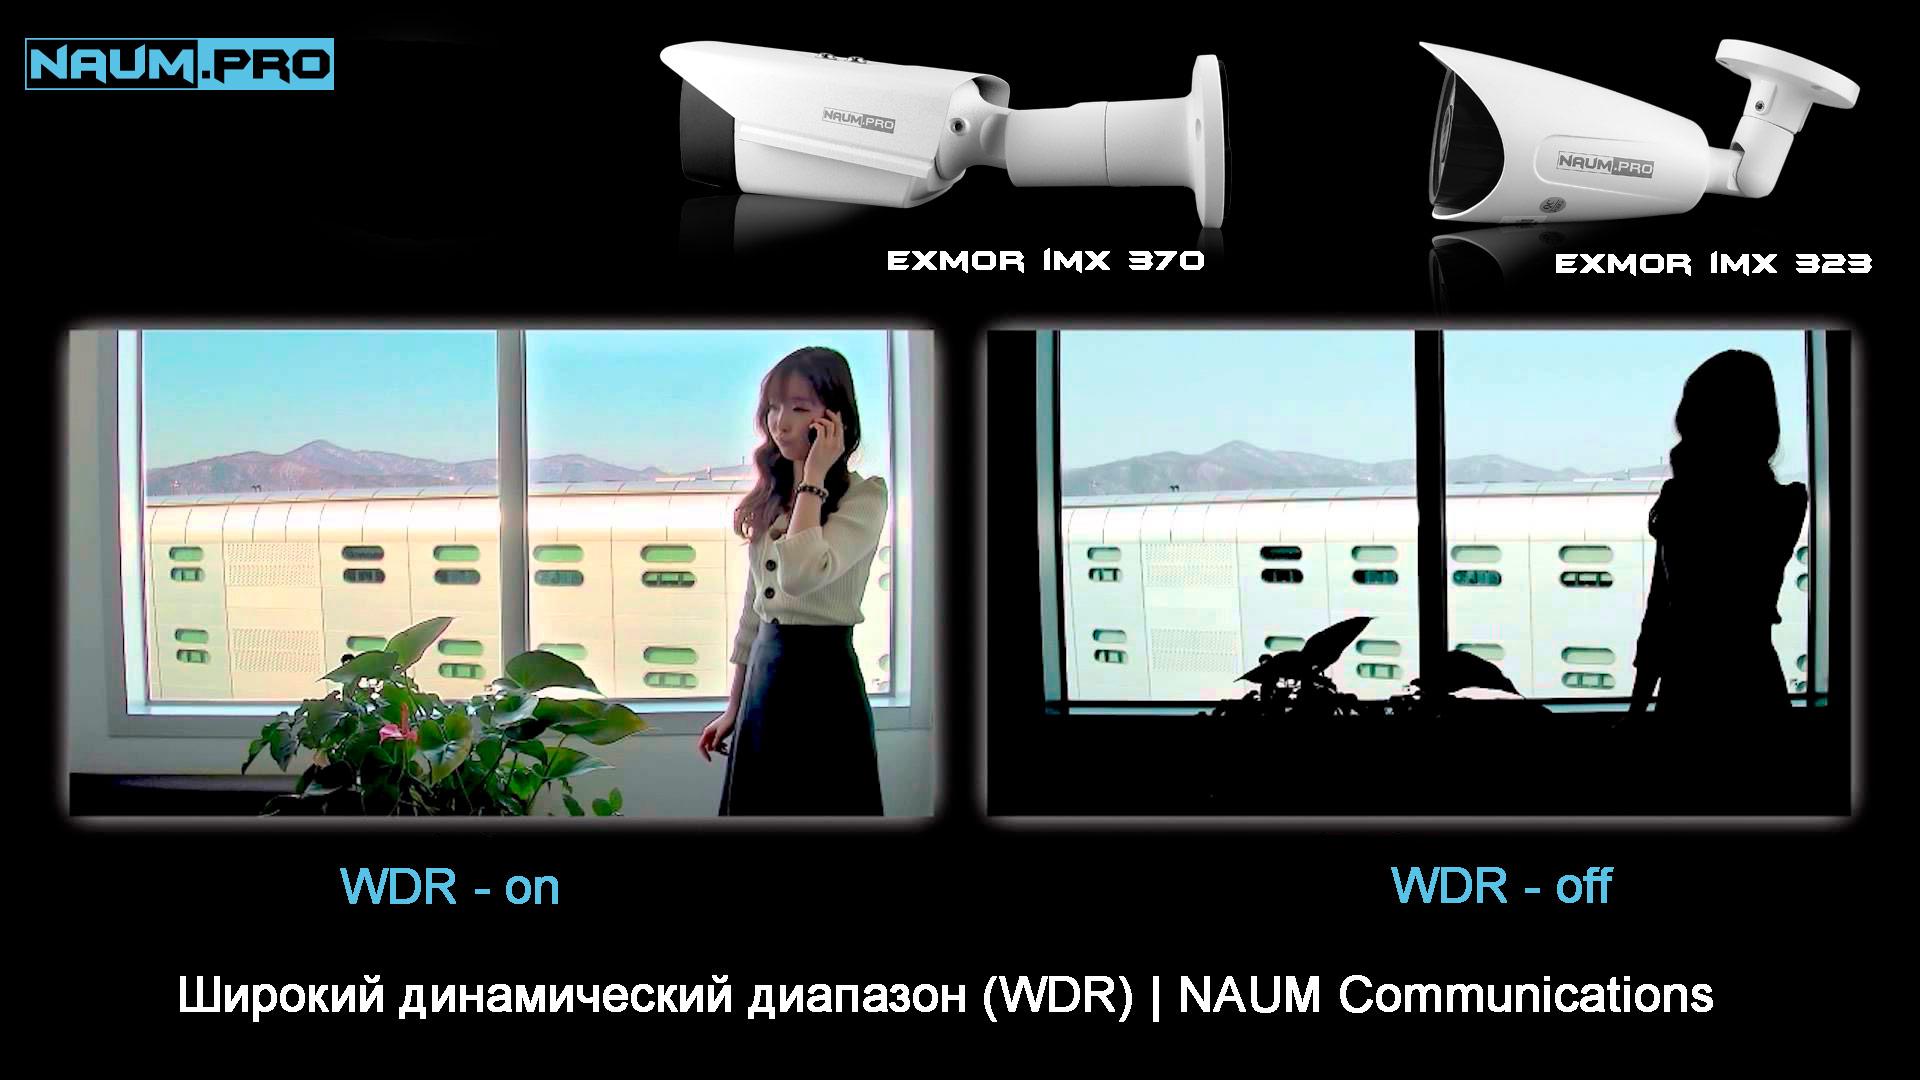 WDR в IP камерах NAUM Exmor imx